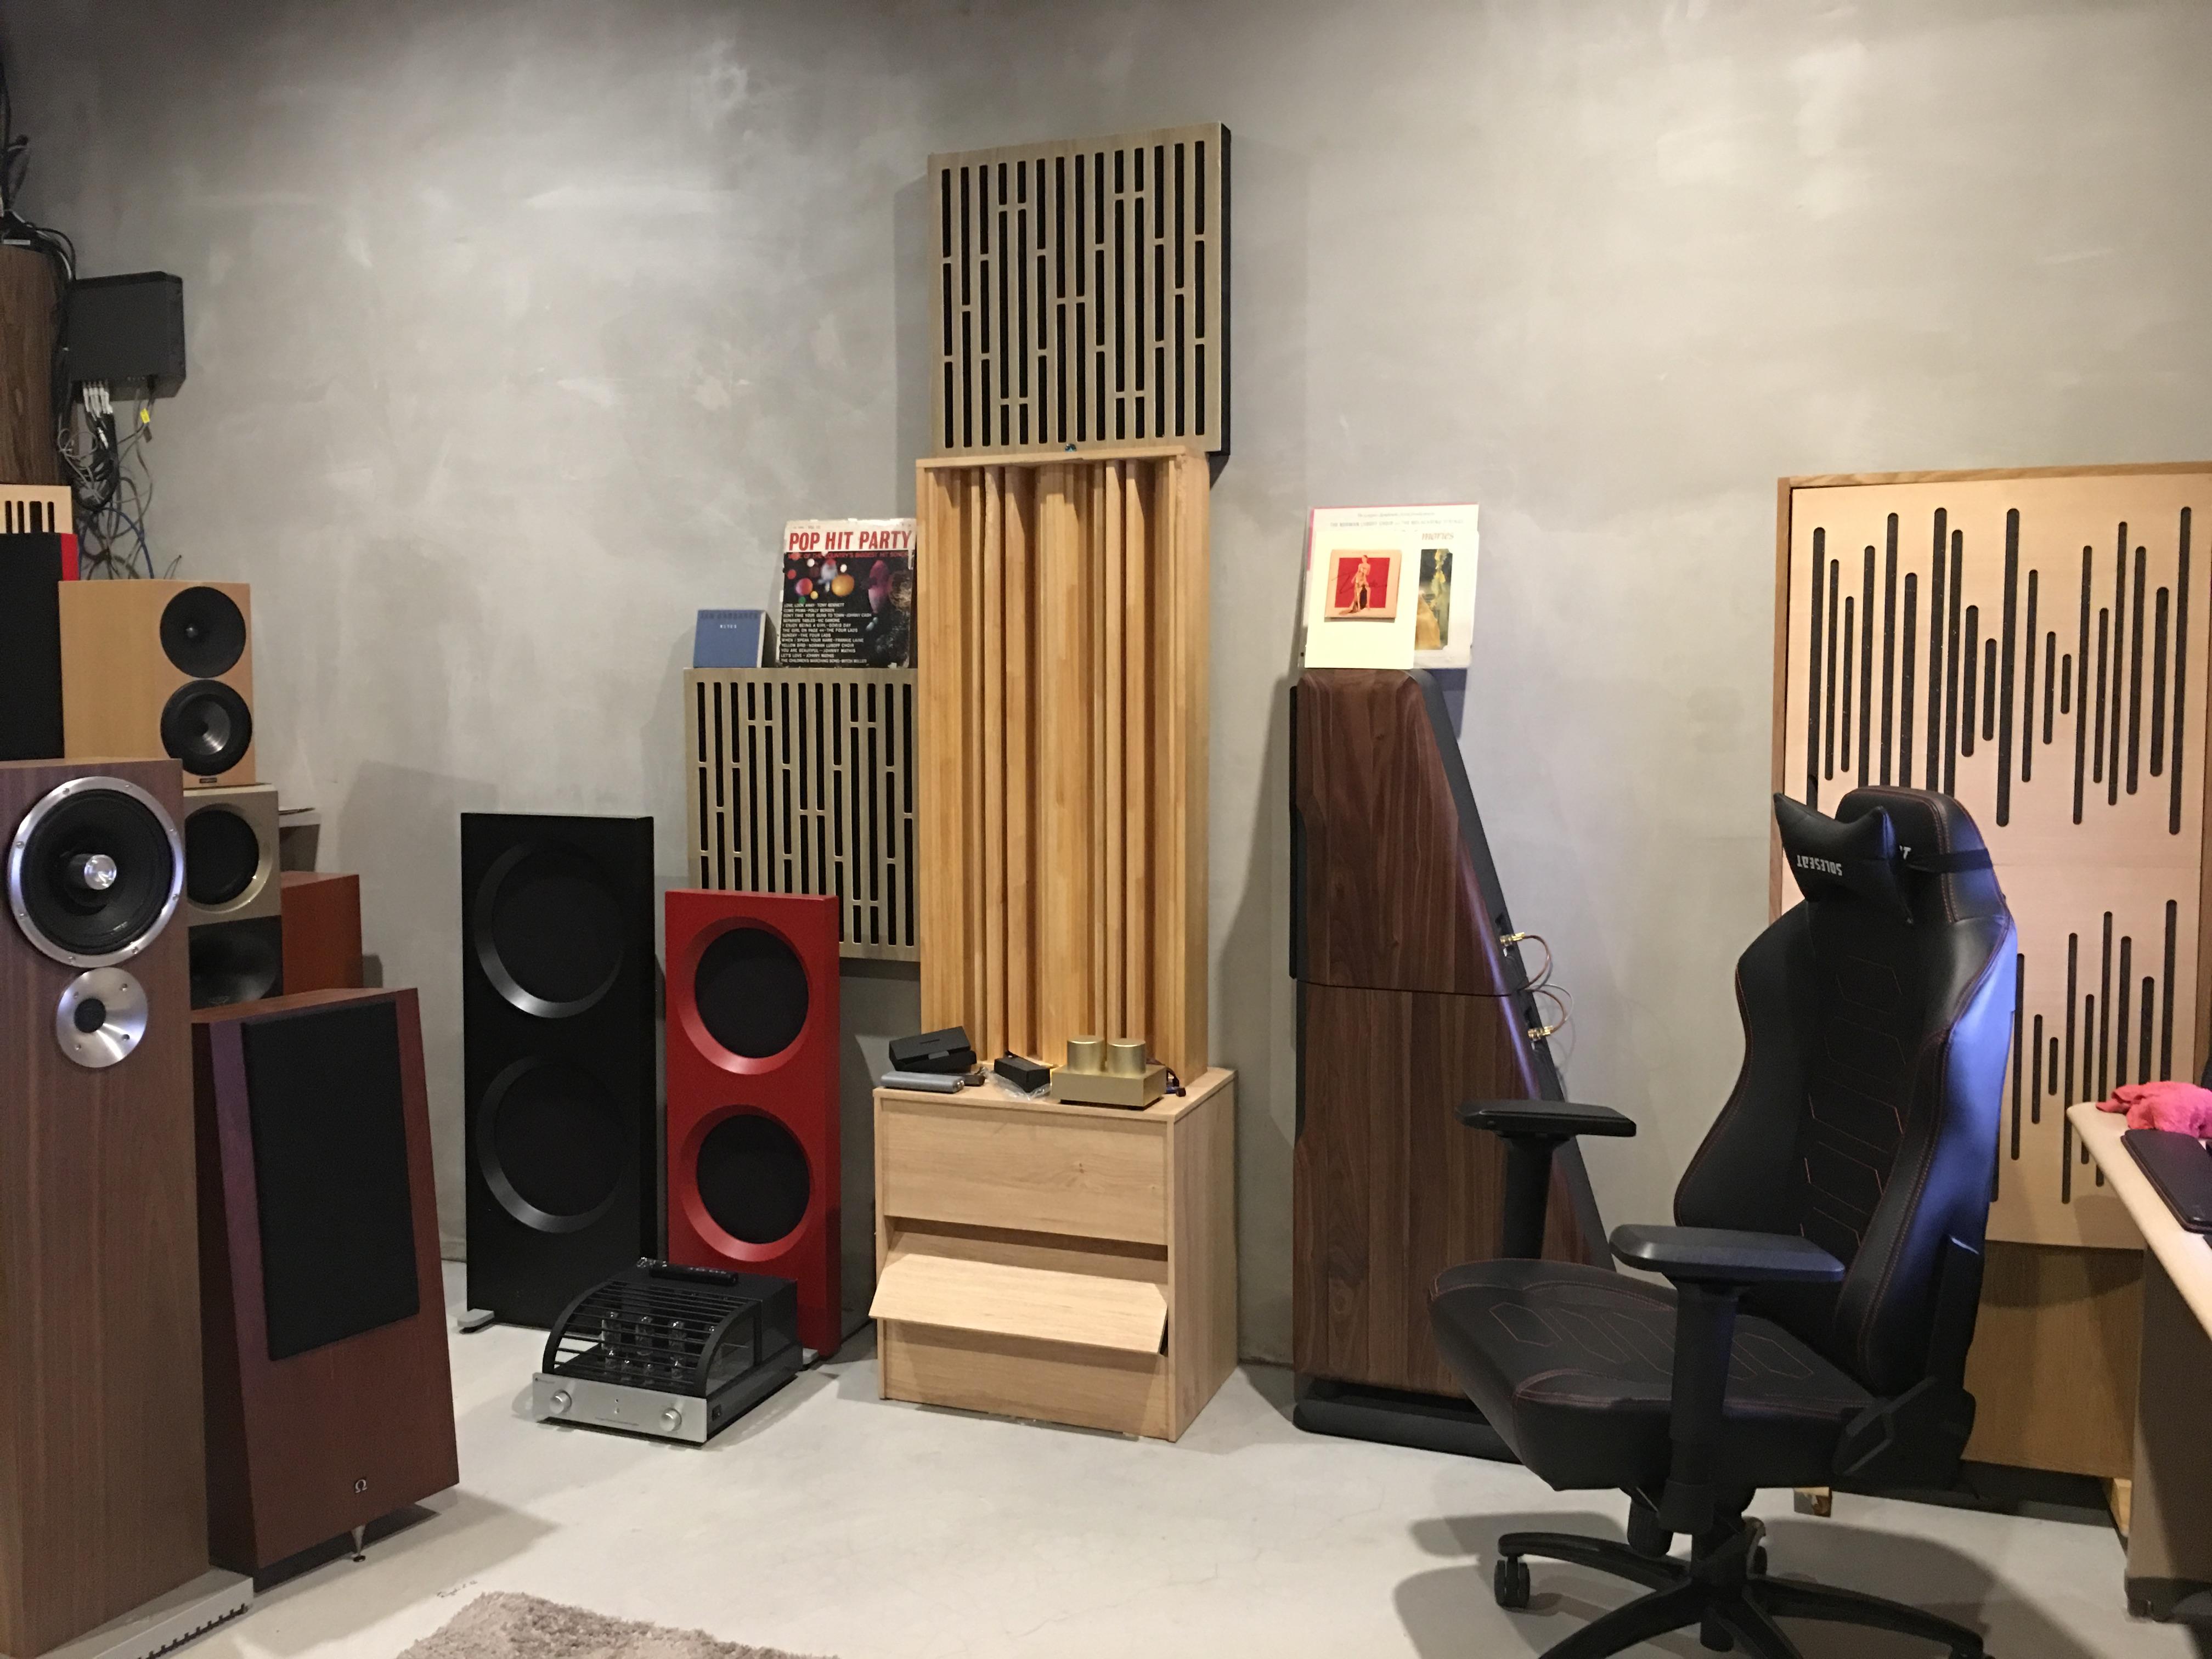 tinhte_zu_druid_v_speaker_room_set_up (2).JPG